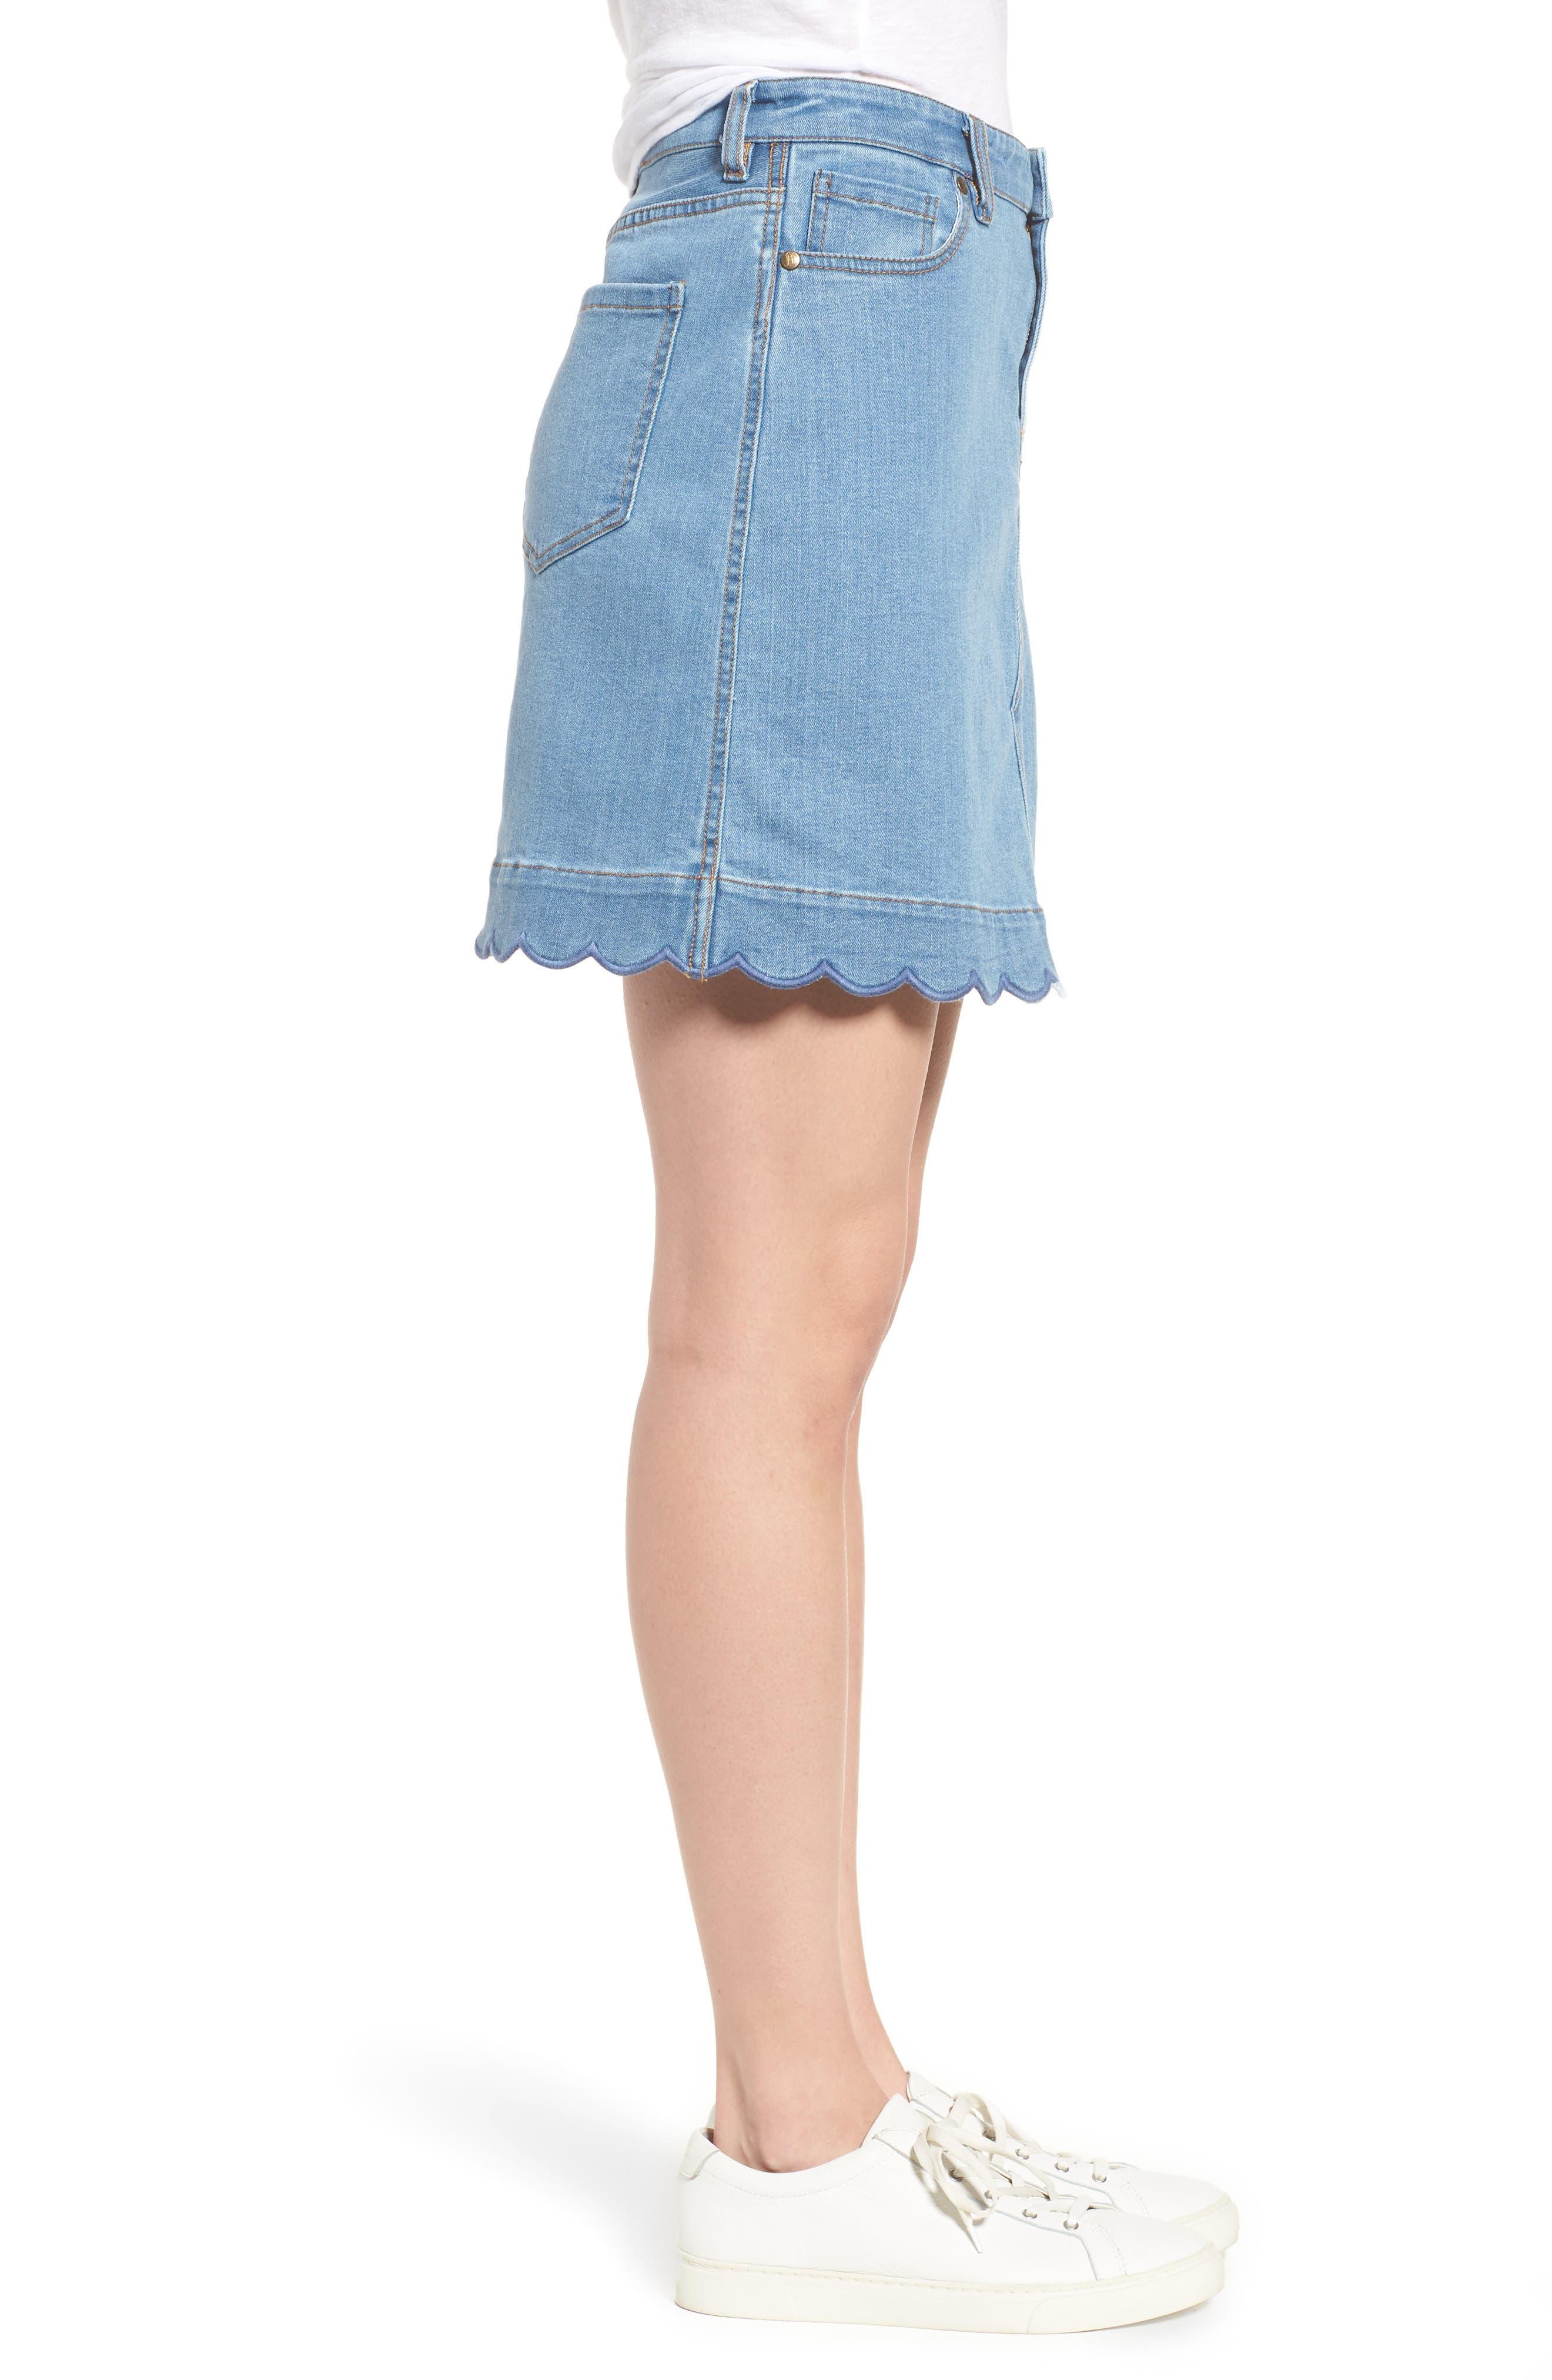 Scallop Denim Skirt,                             Alternate thumbnail 3, color,                             Blue